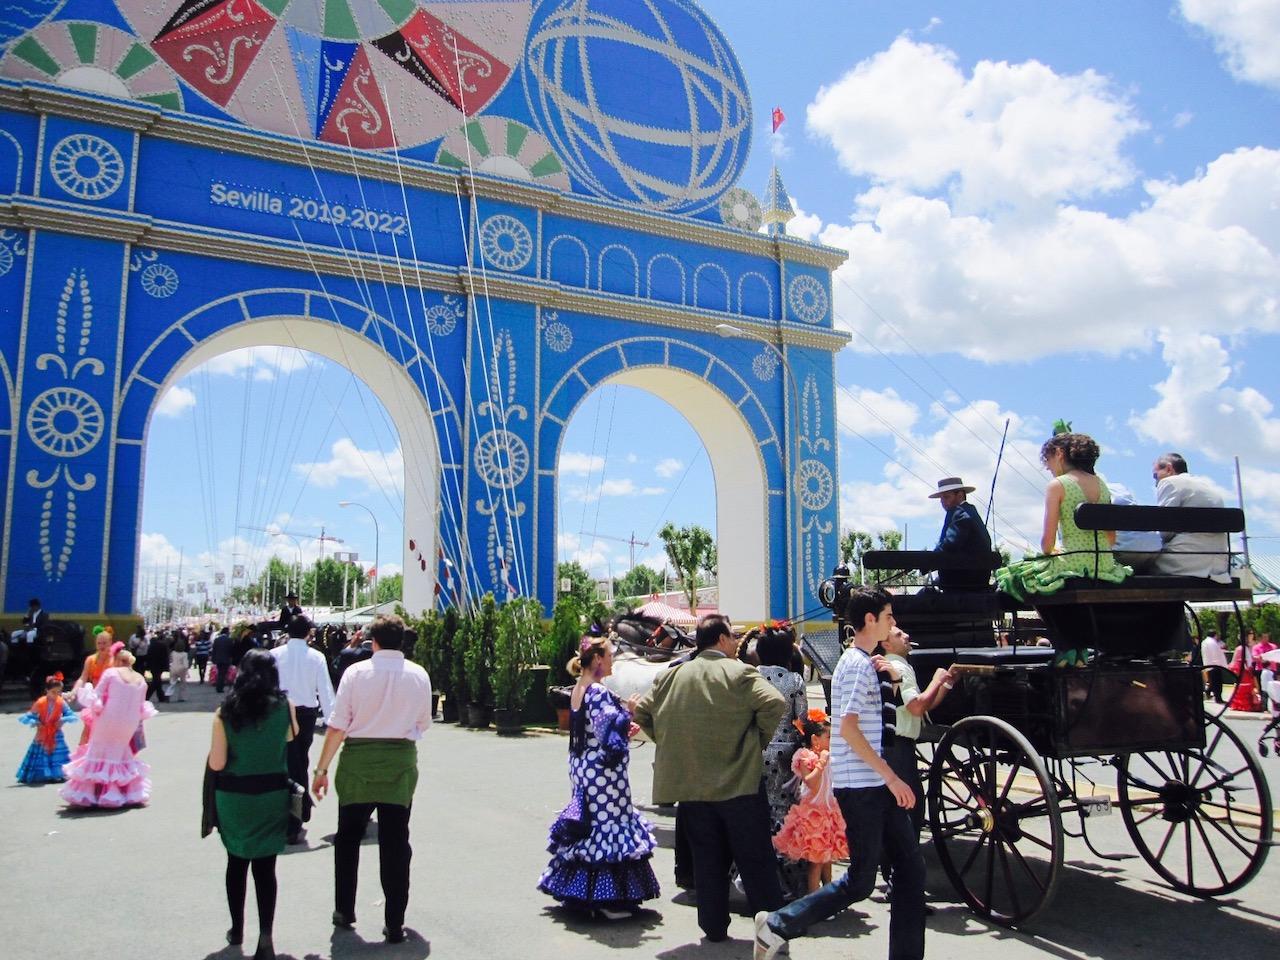 Eingangstor zum Fest Feria de Abril, Sevilla, Andalusien